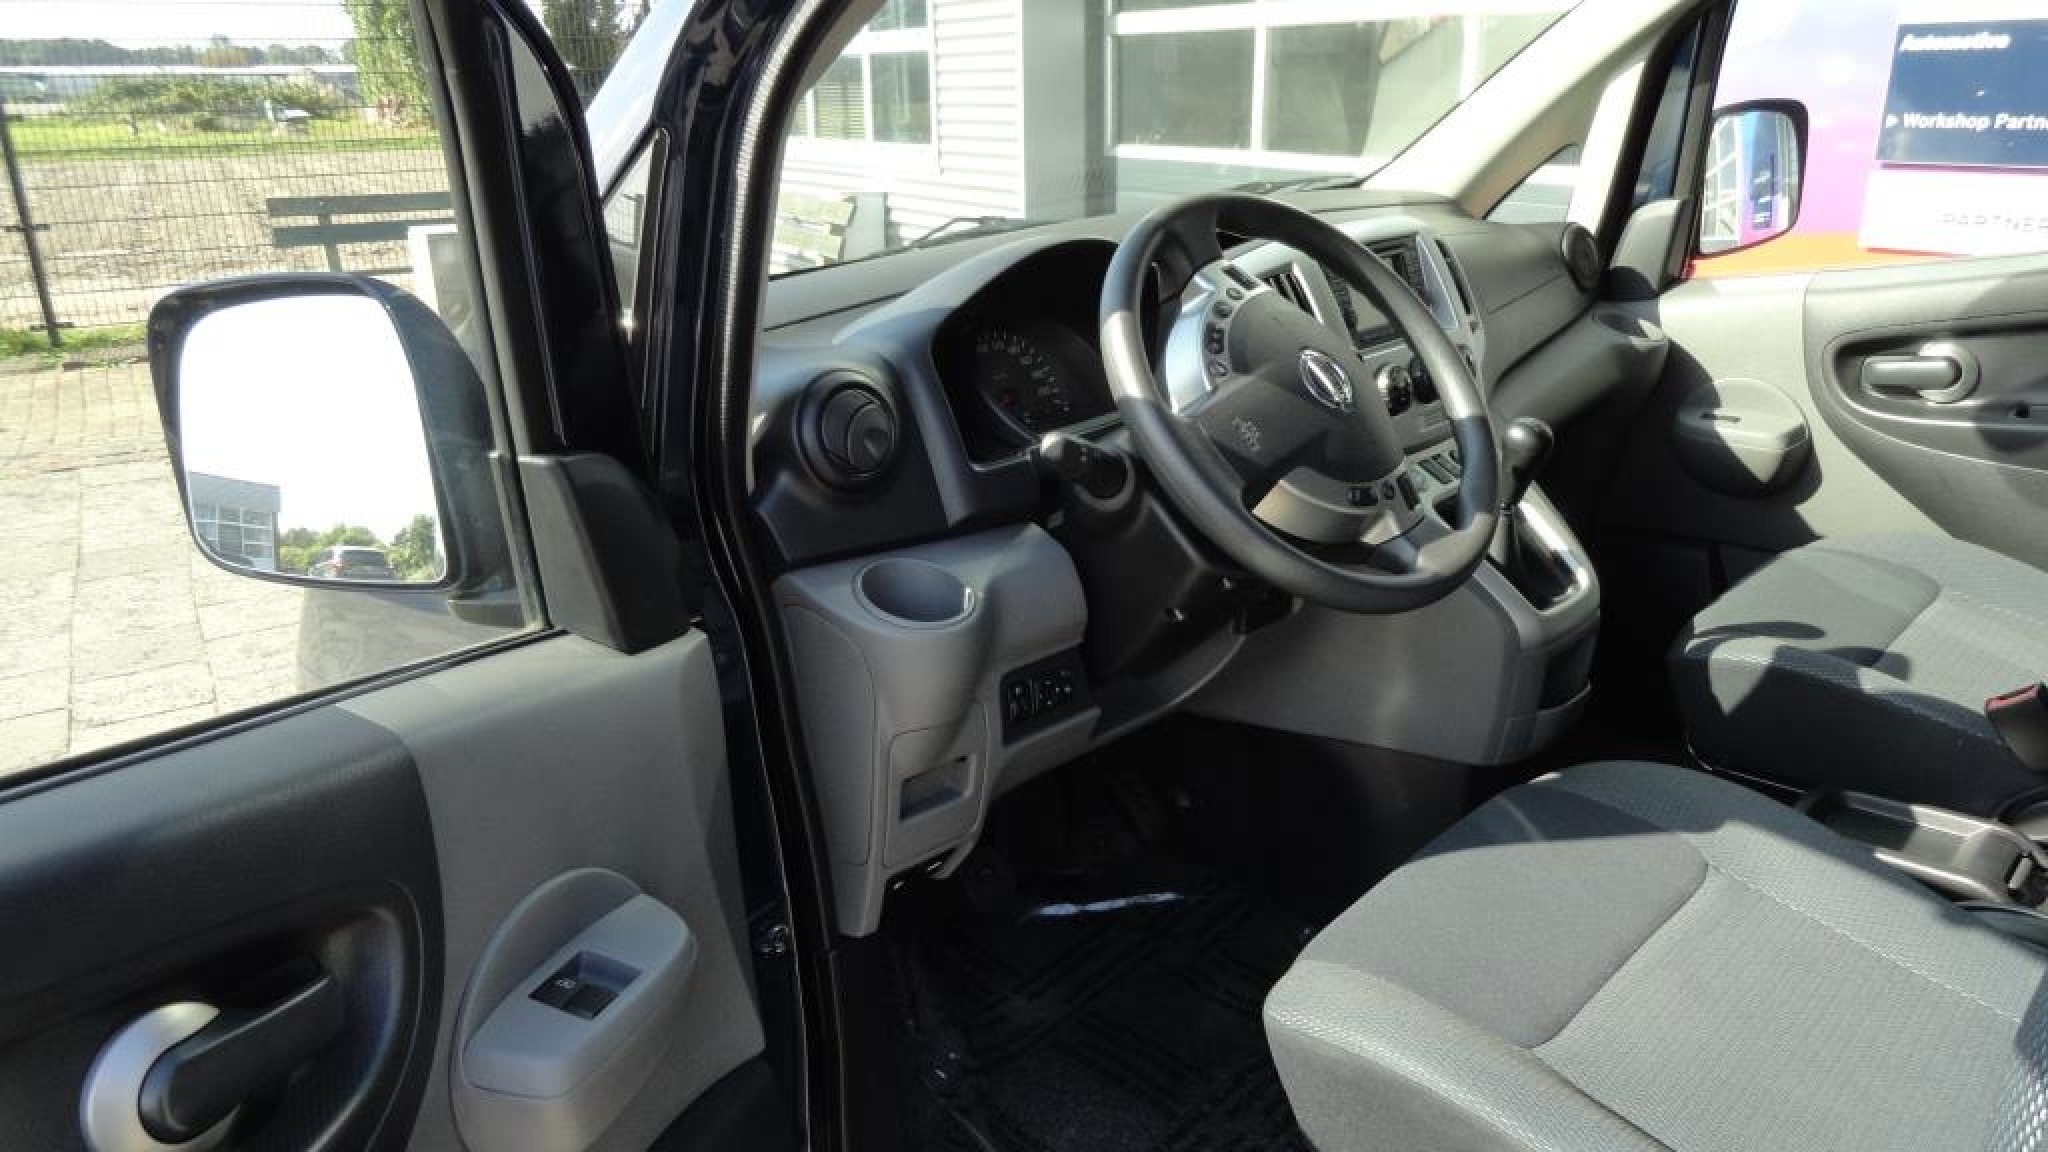 Nissan-NV 200 Evalia-13